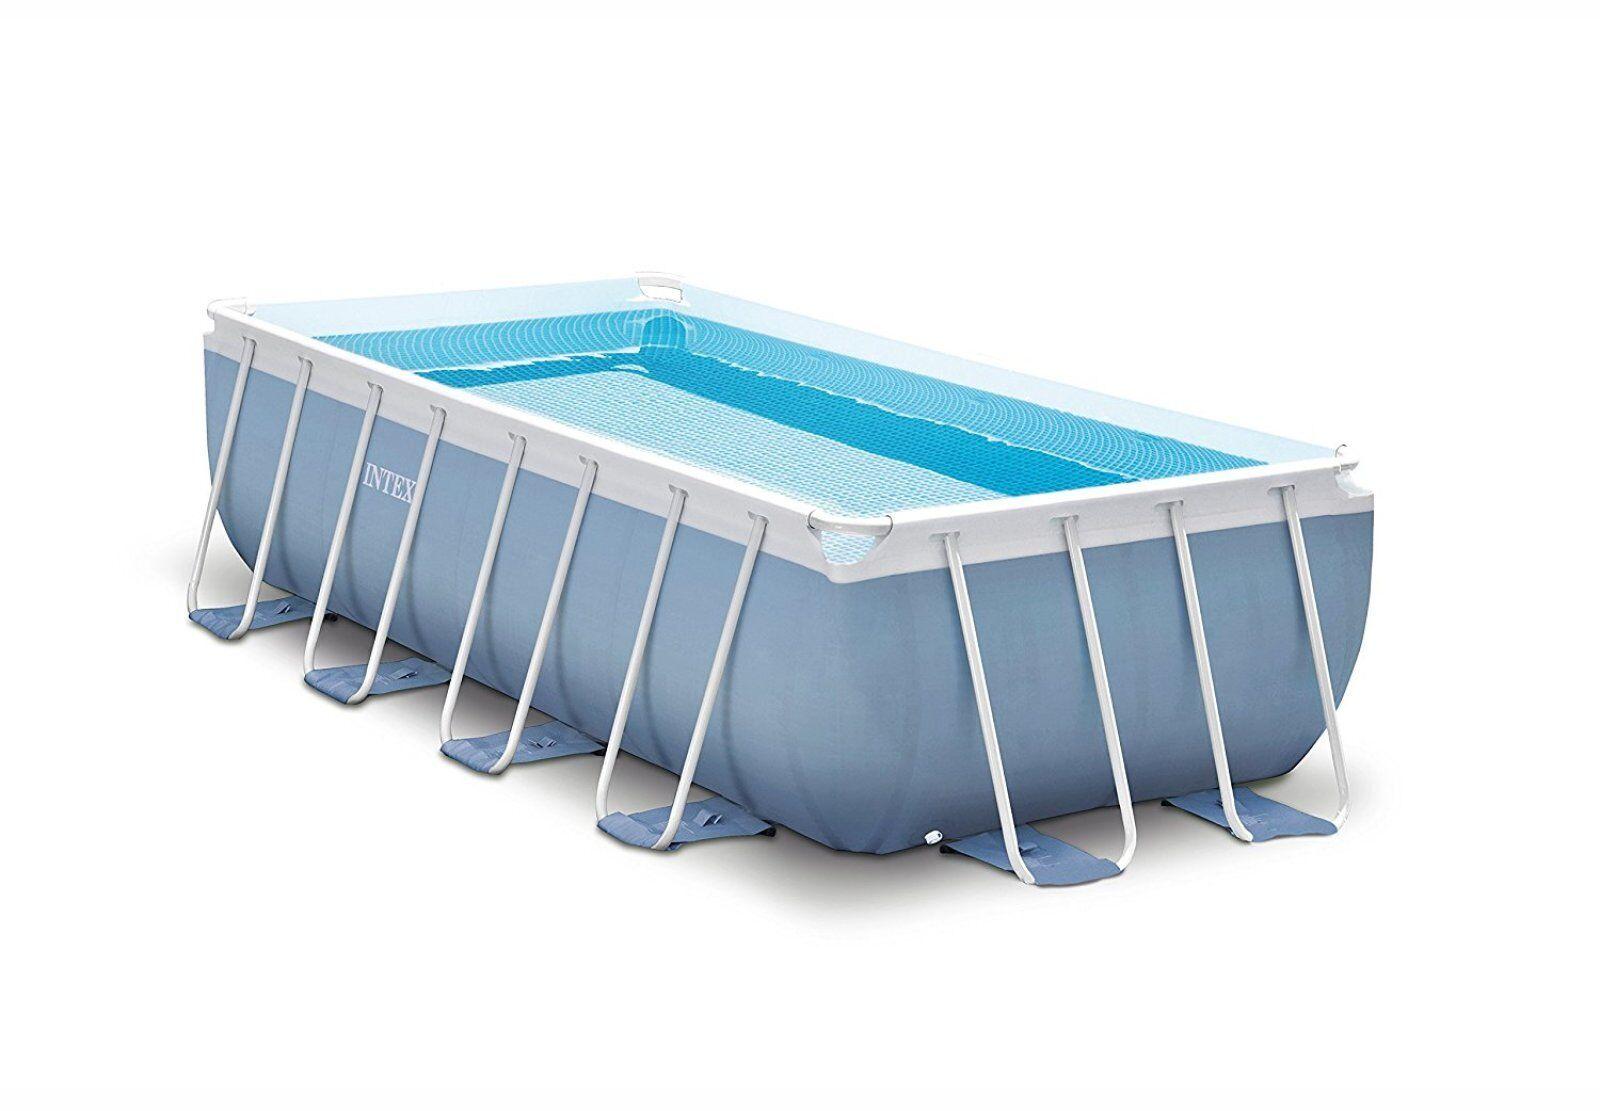 Outdoor Rectangular Frame Swimming Pool Set 16ft X 8ft X 42 Above ...